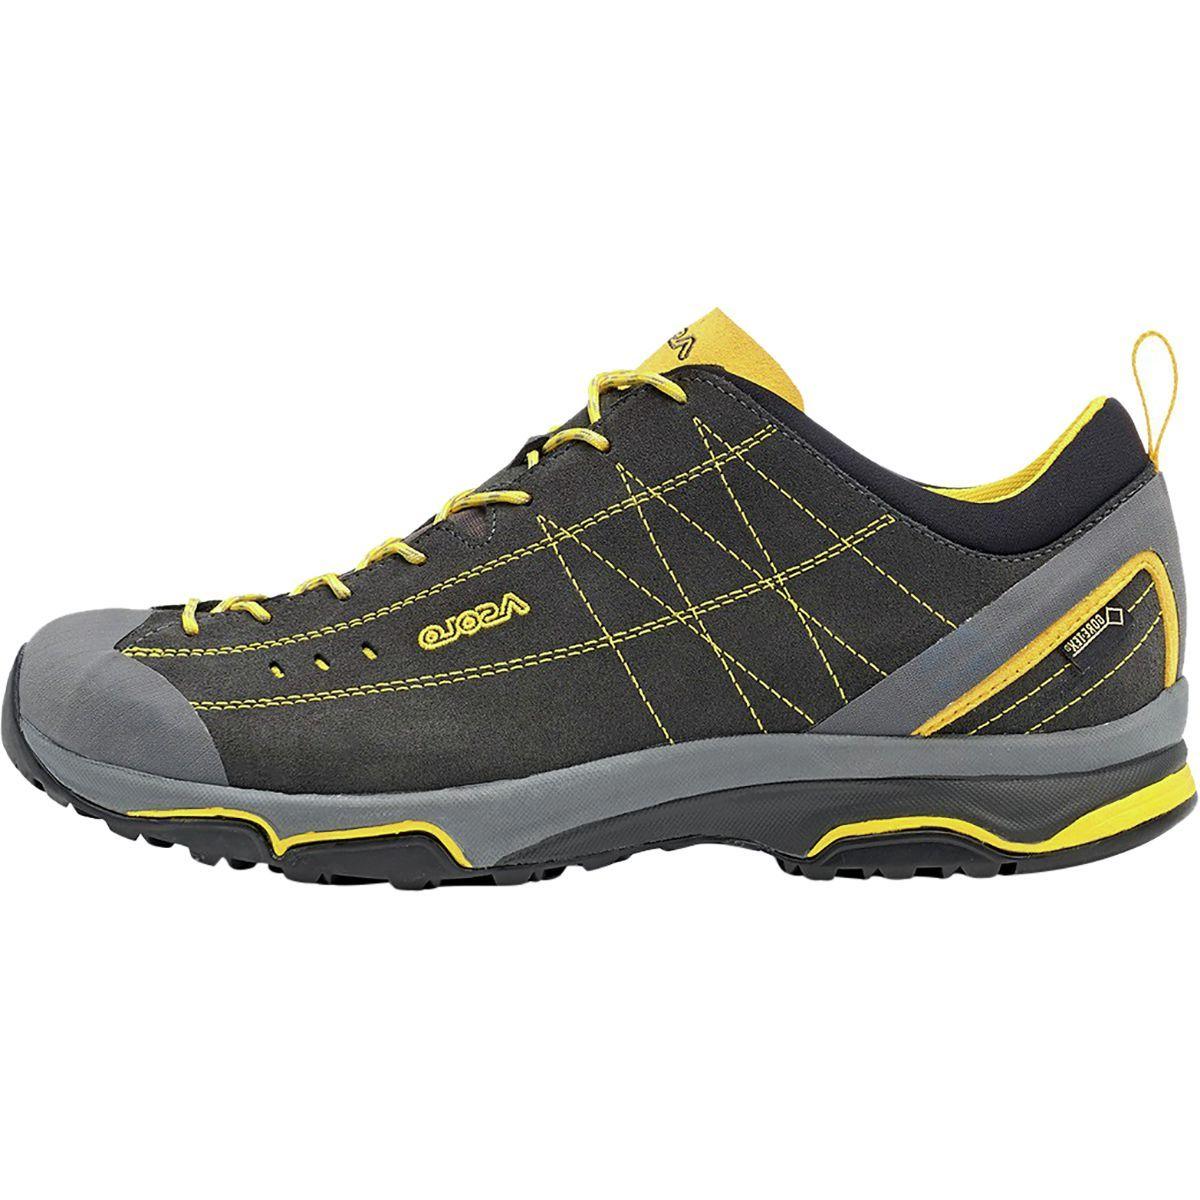 Asolo Nucleon GV Hiking Shoe - Men's